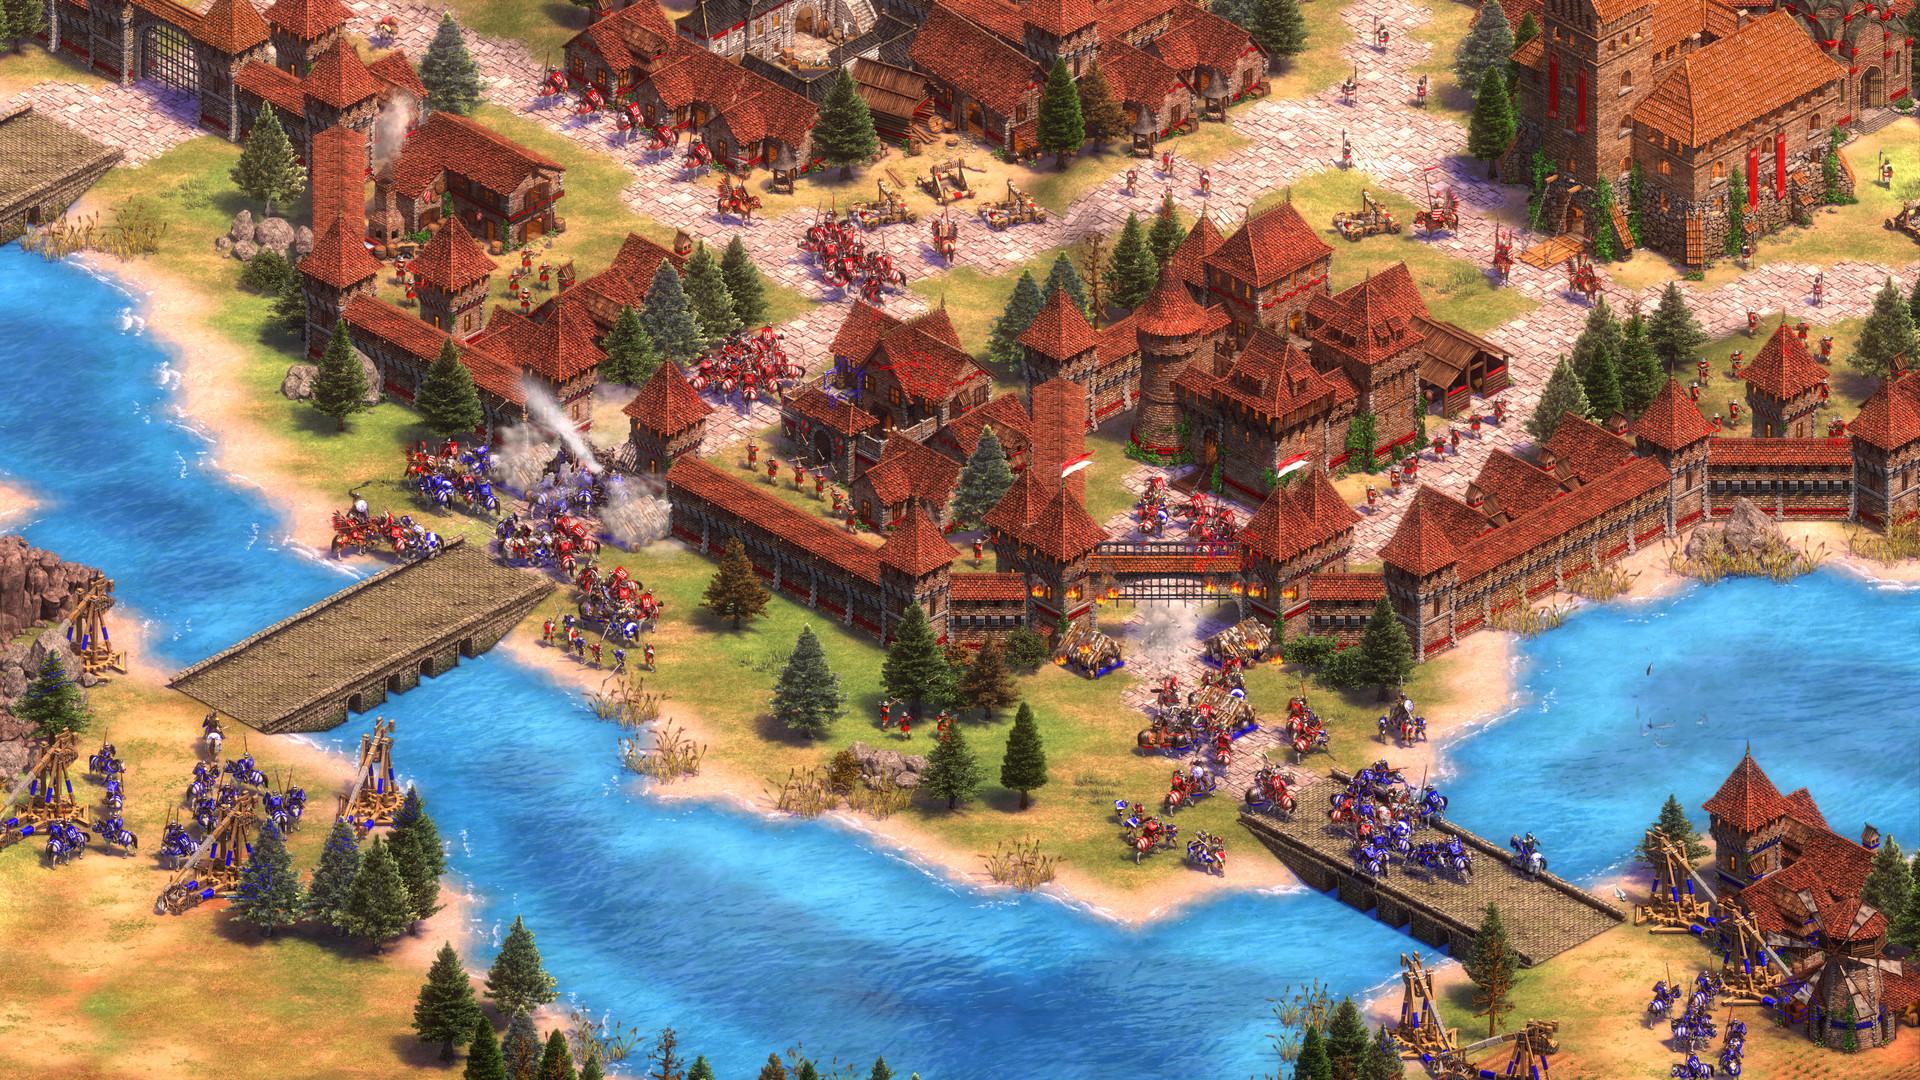 Age Of Empires Ii Definitive Edition Has Nostalgic Launch Trailer